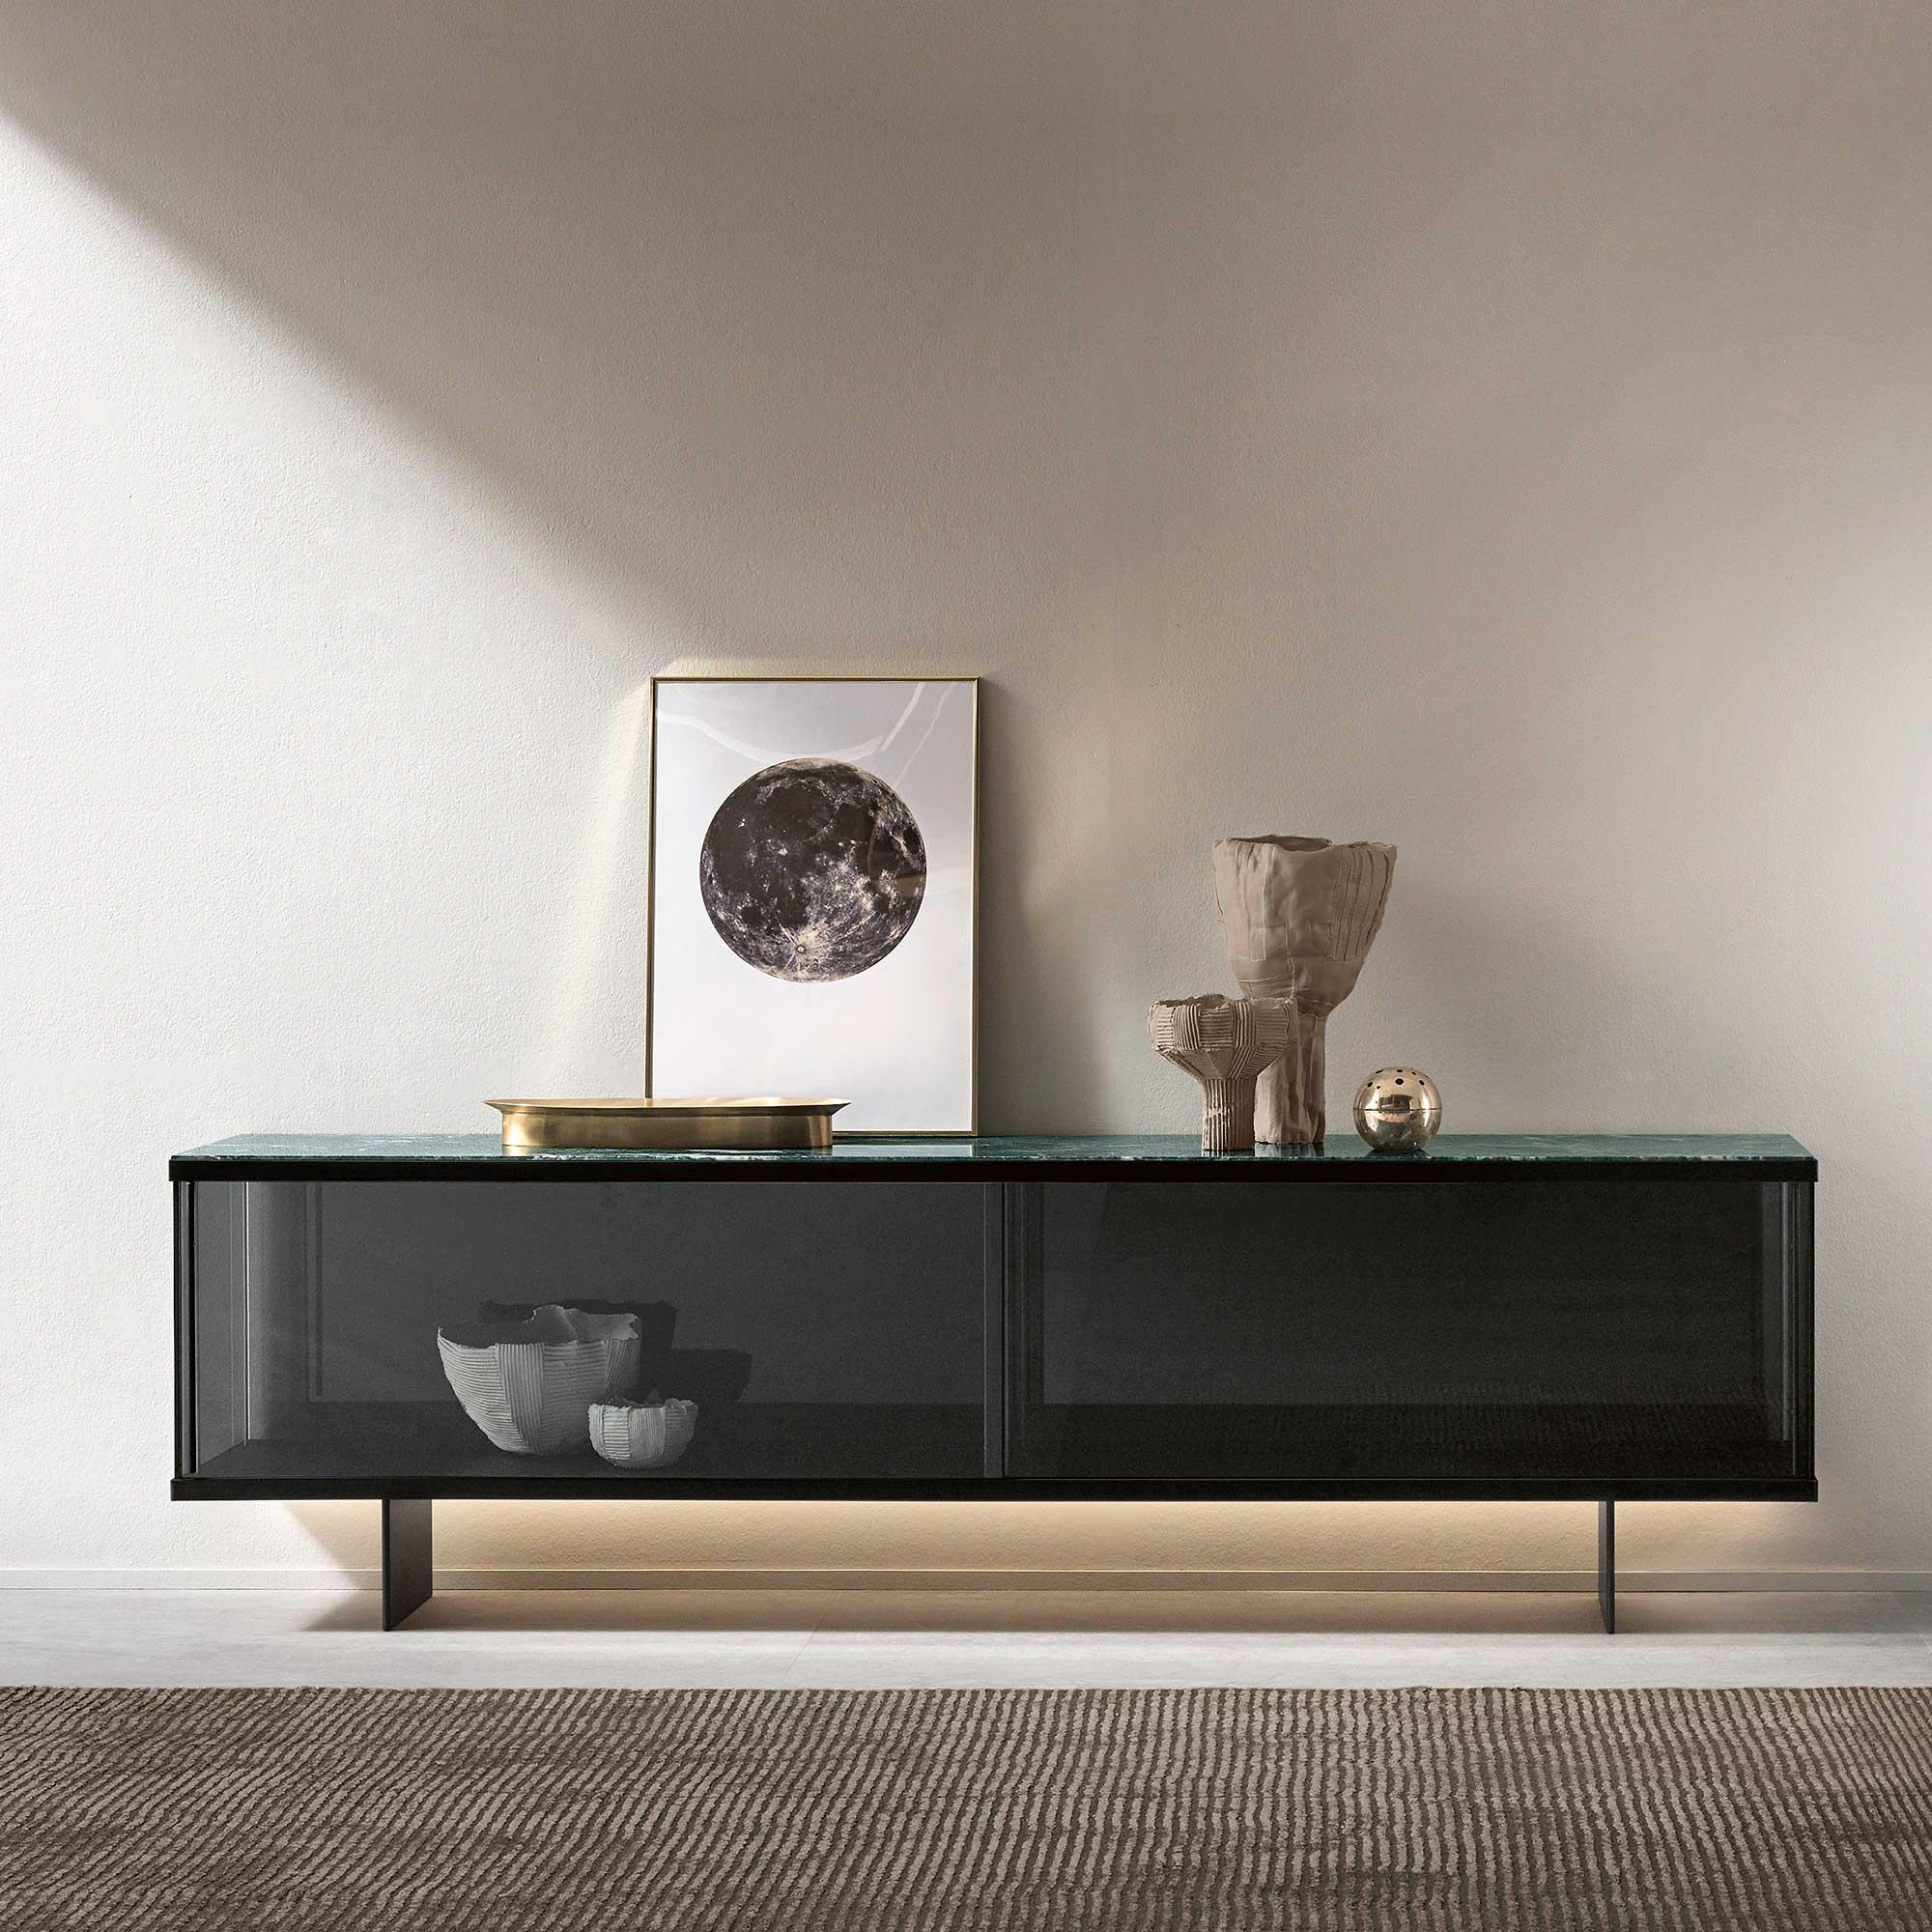 Bartoli Design - East Side - Tonelli Design